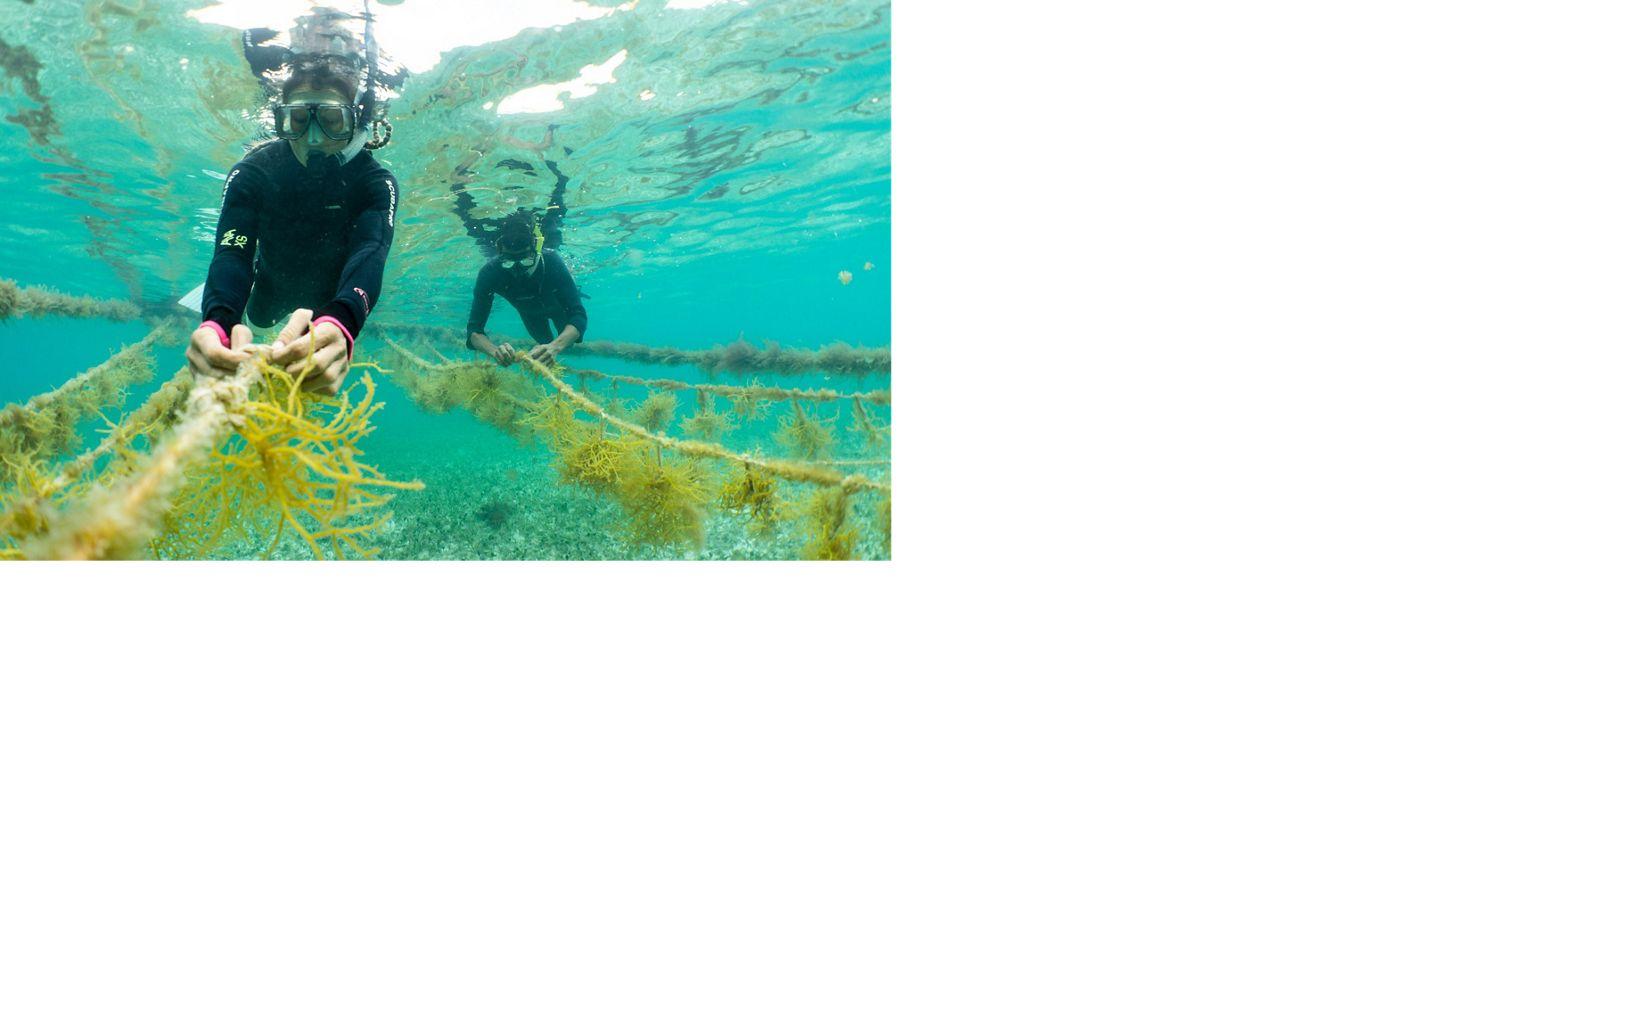 Restauración de oceanos en Belice